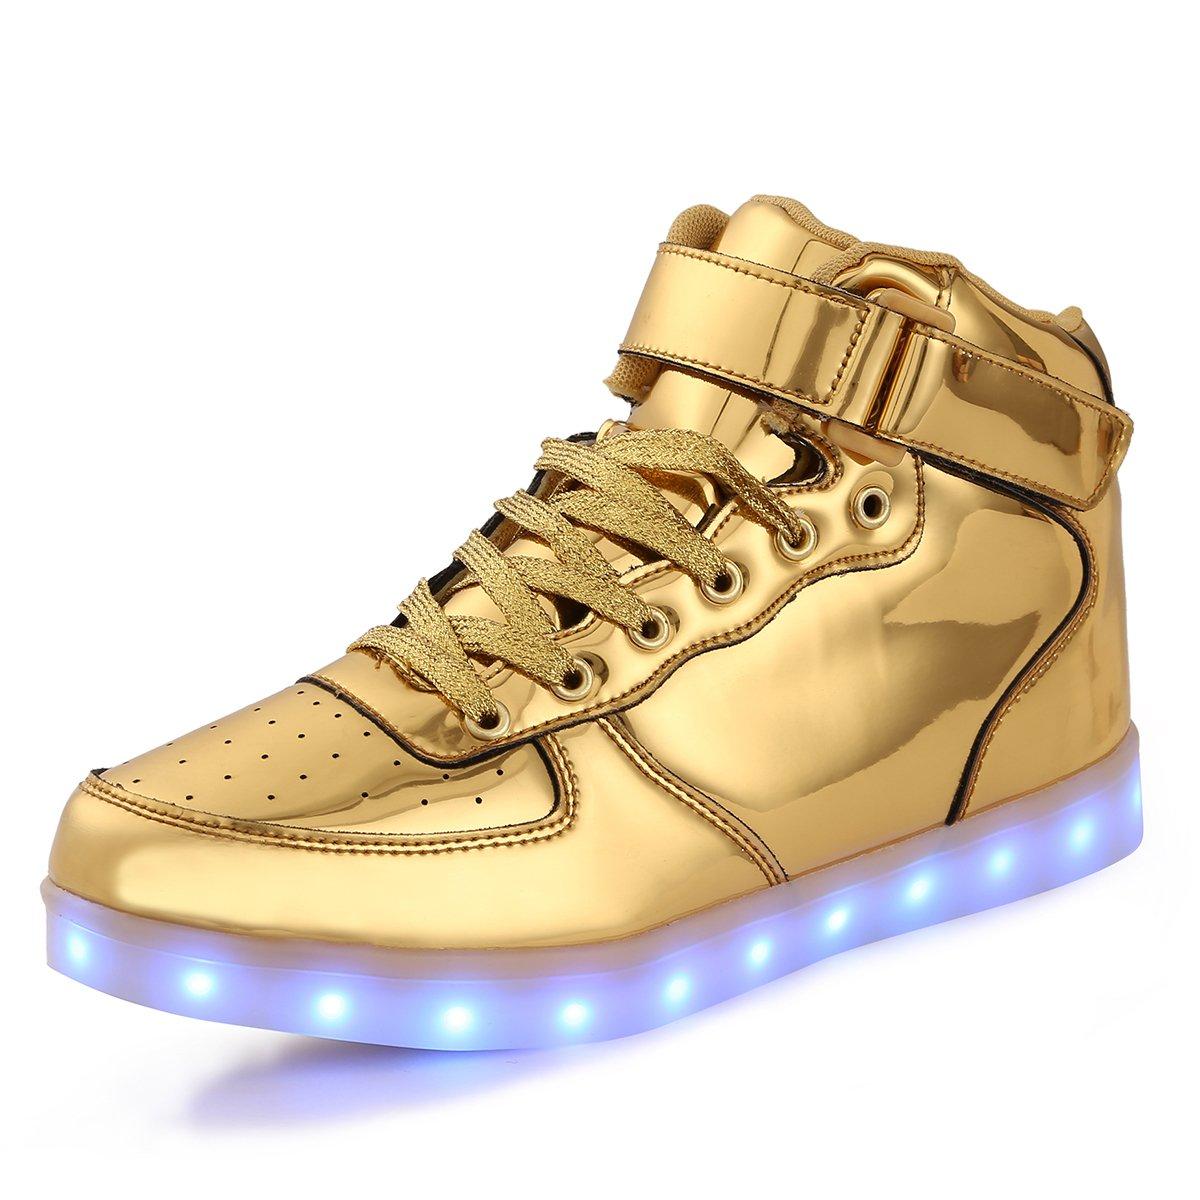 FLARUT Kids High Top LED Shoes Light Up USB Charging Boys Girls Sneakers(US 2 Little Kid/EU 34,Gold)